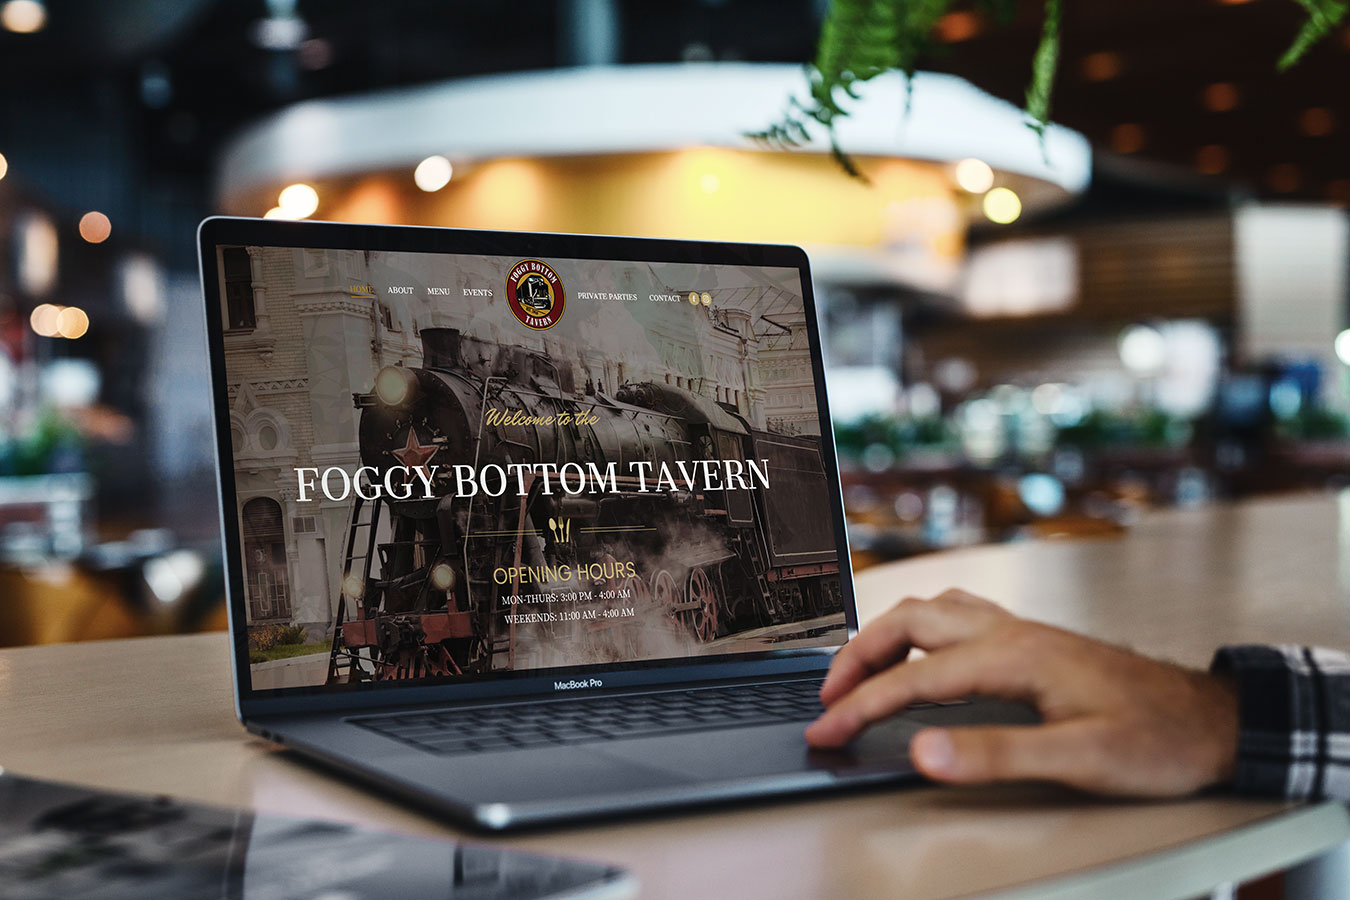 Foggy Bottom Tavern